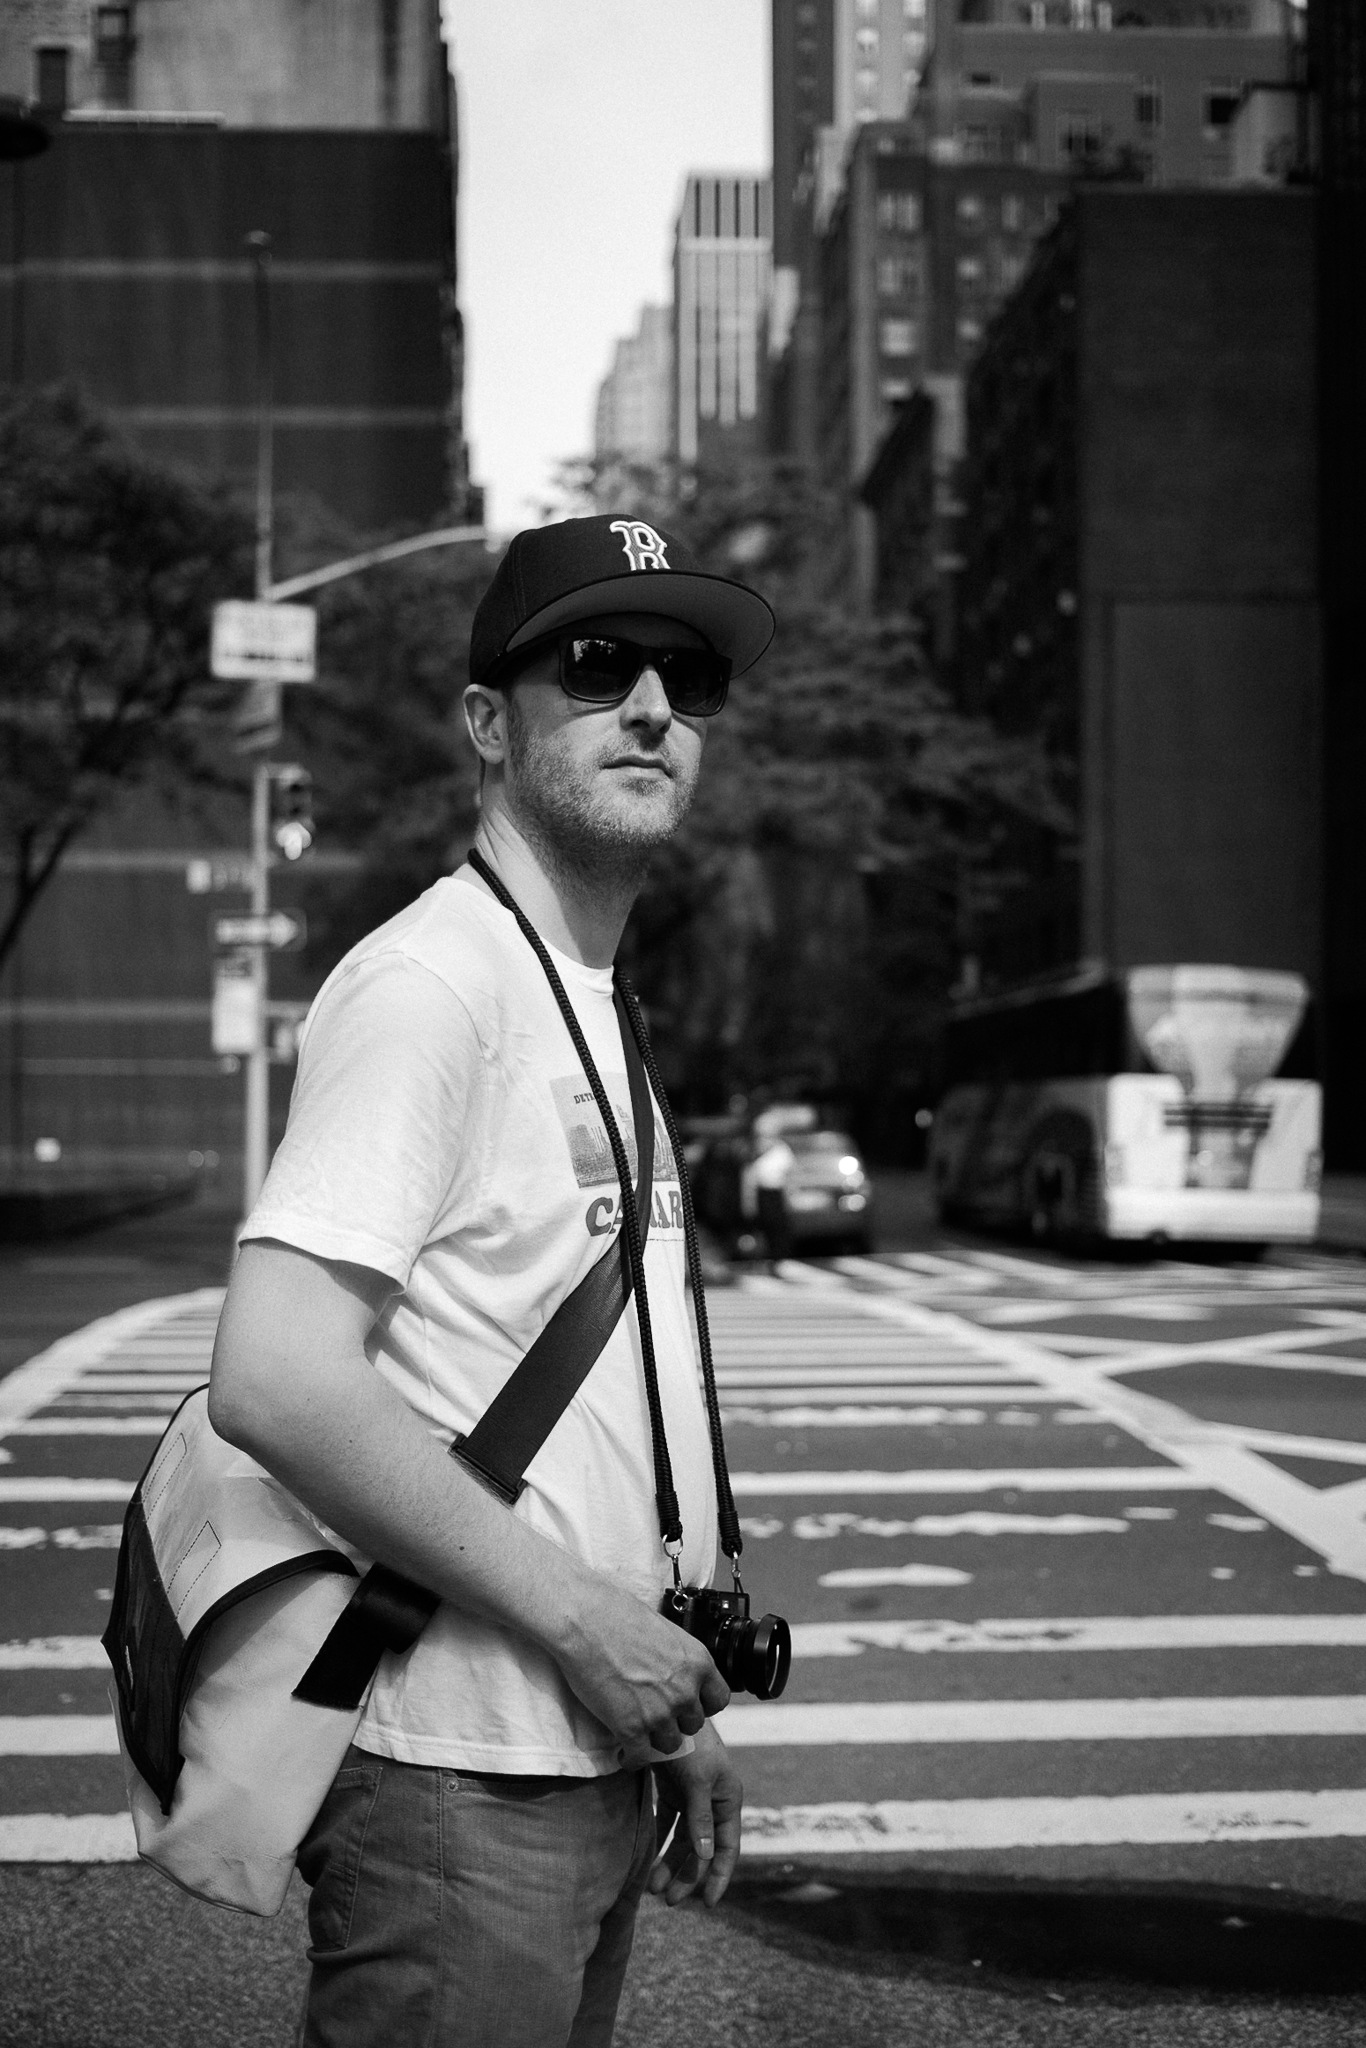 2015-05-14-NYC-0825.jpg